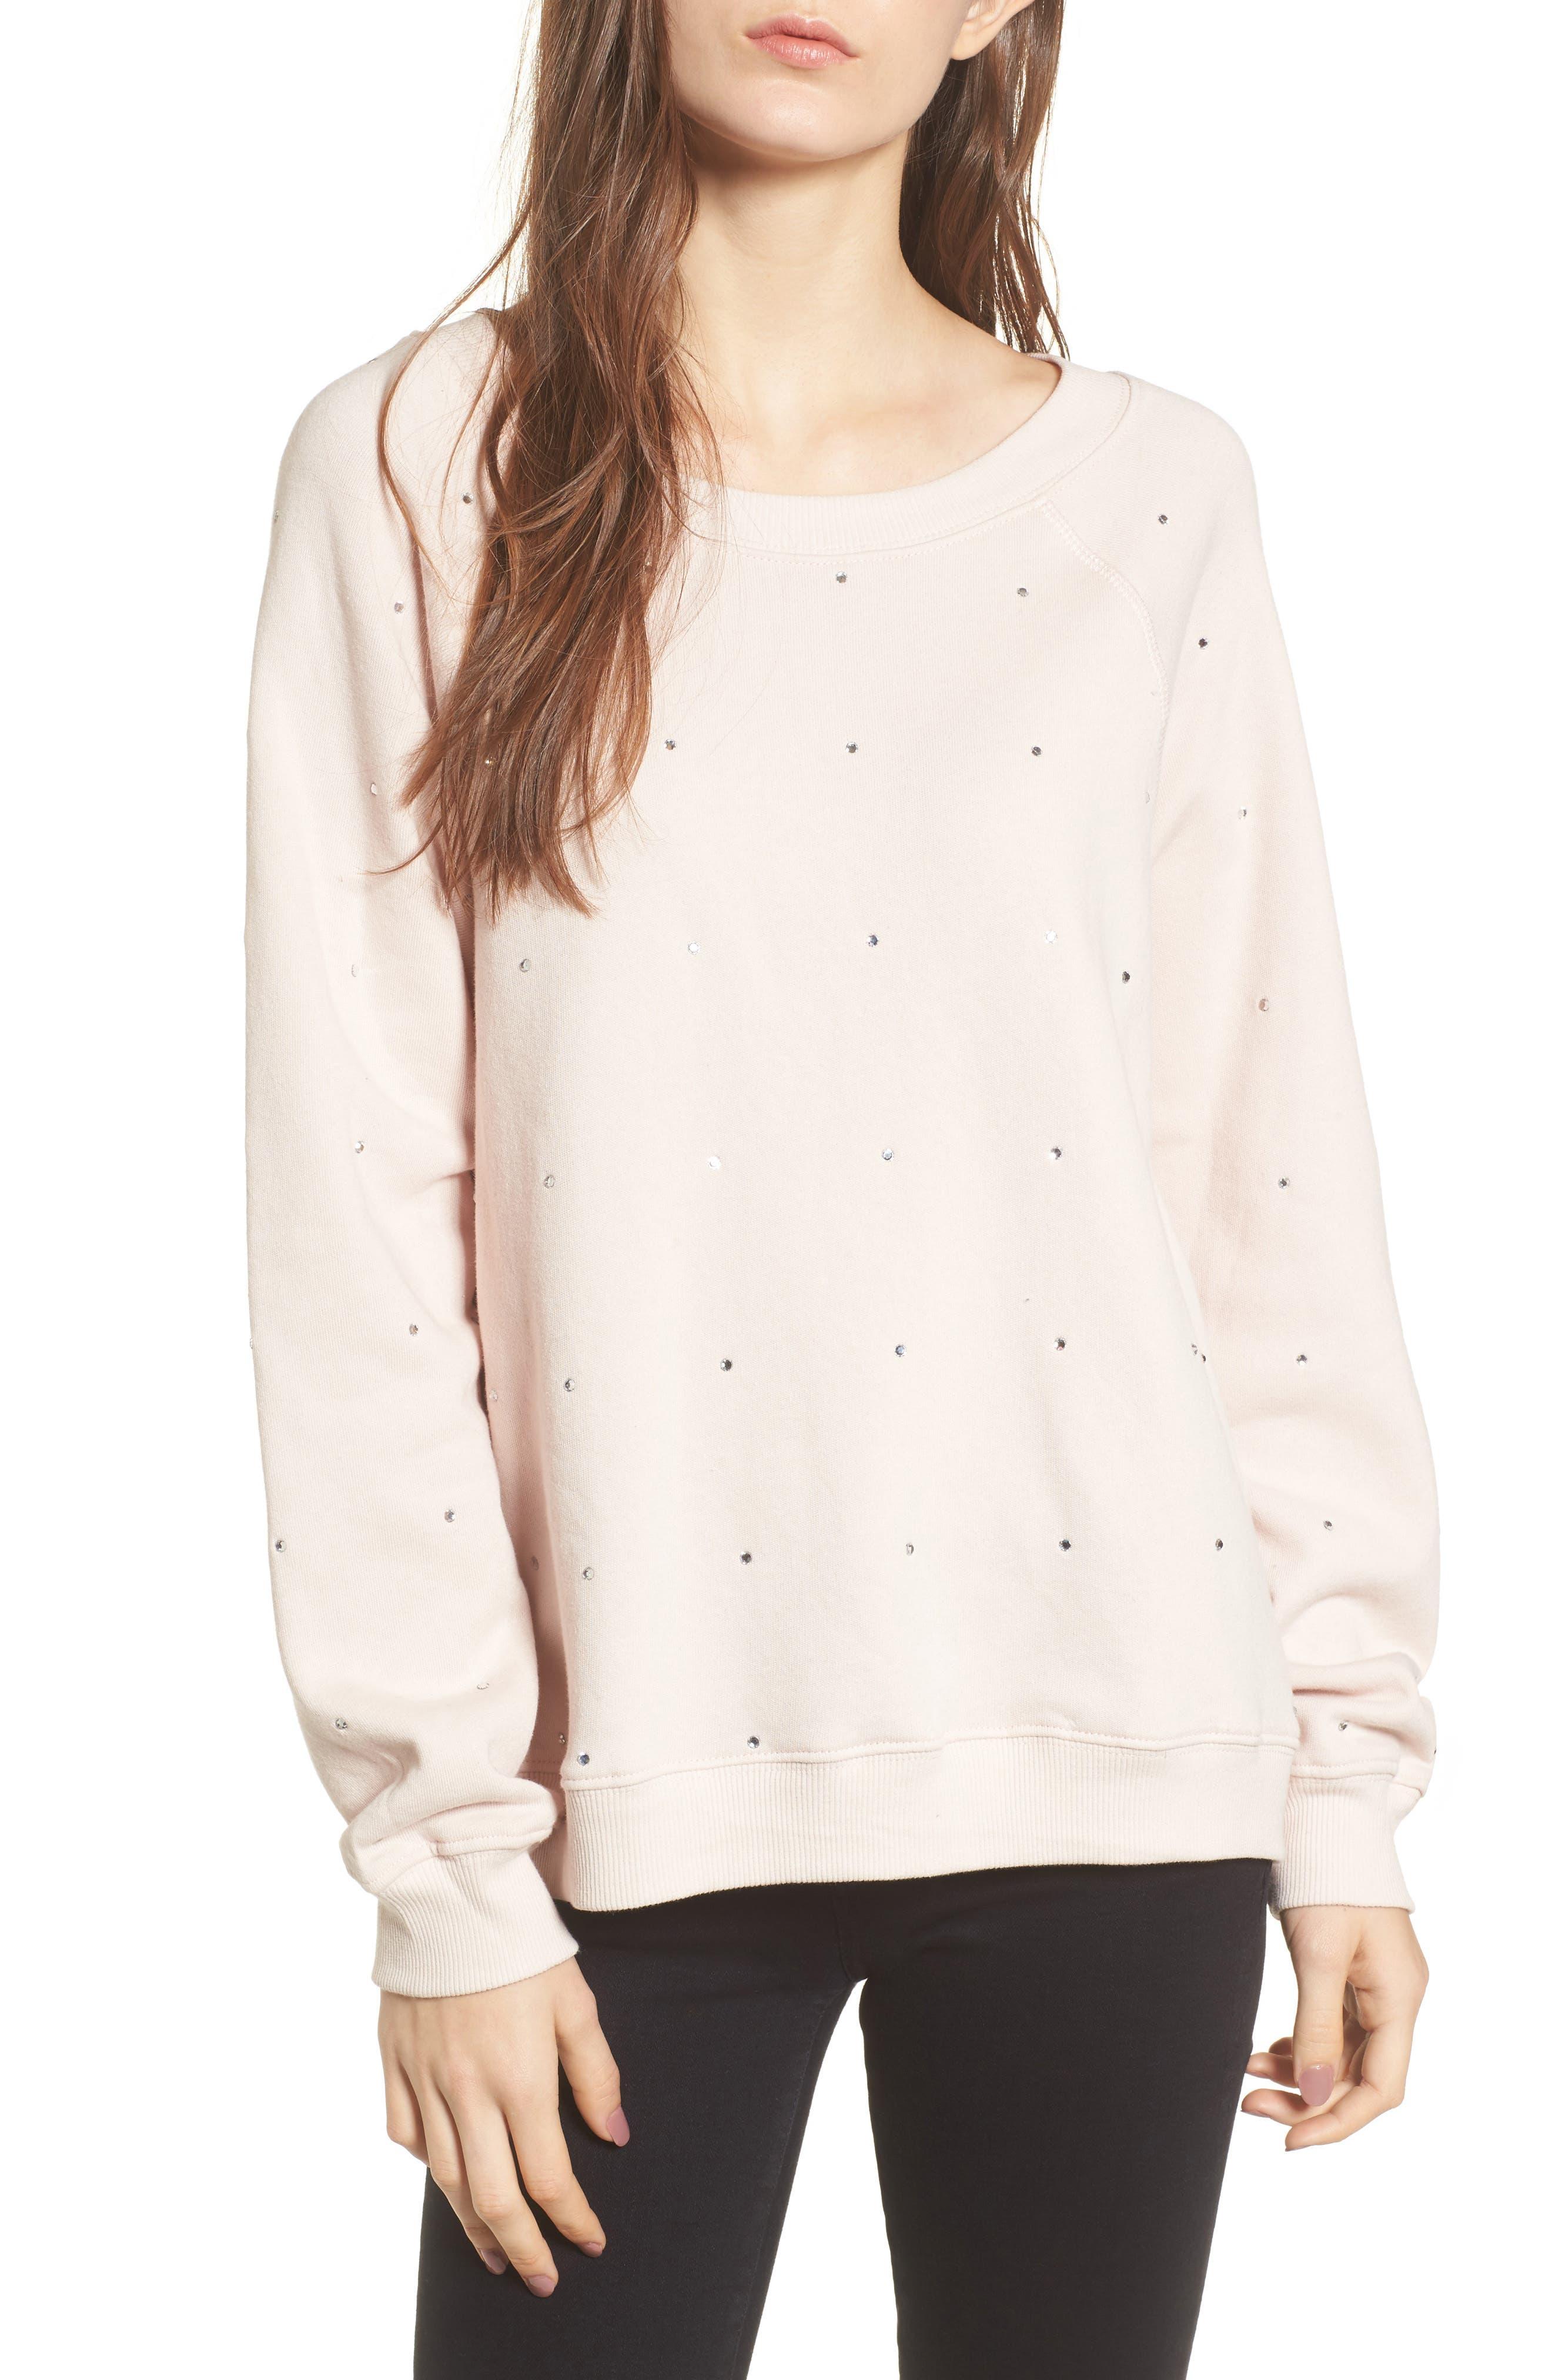 Wildfox Glitz Sweatshirt